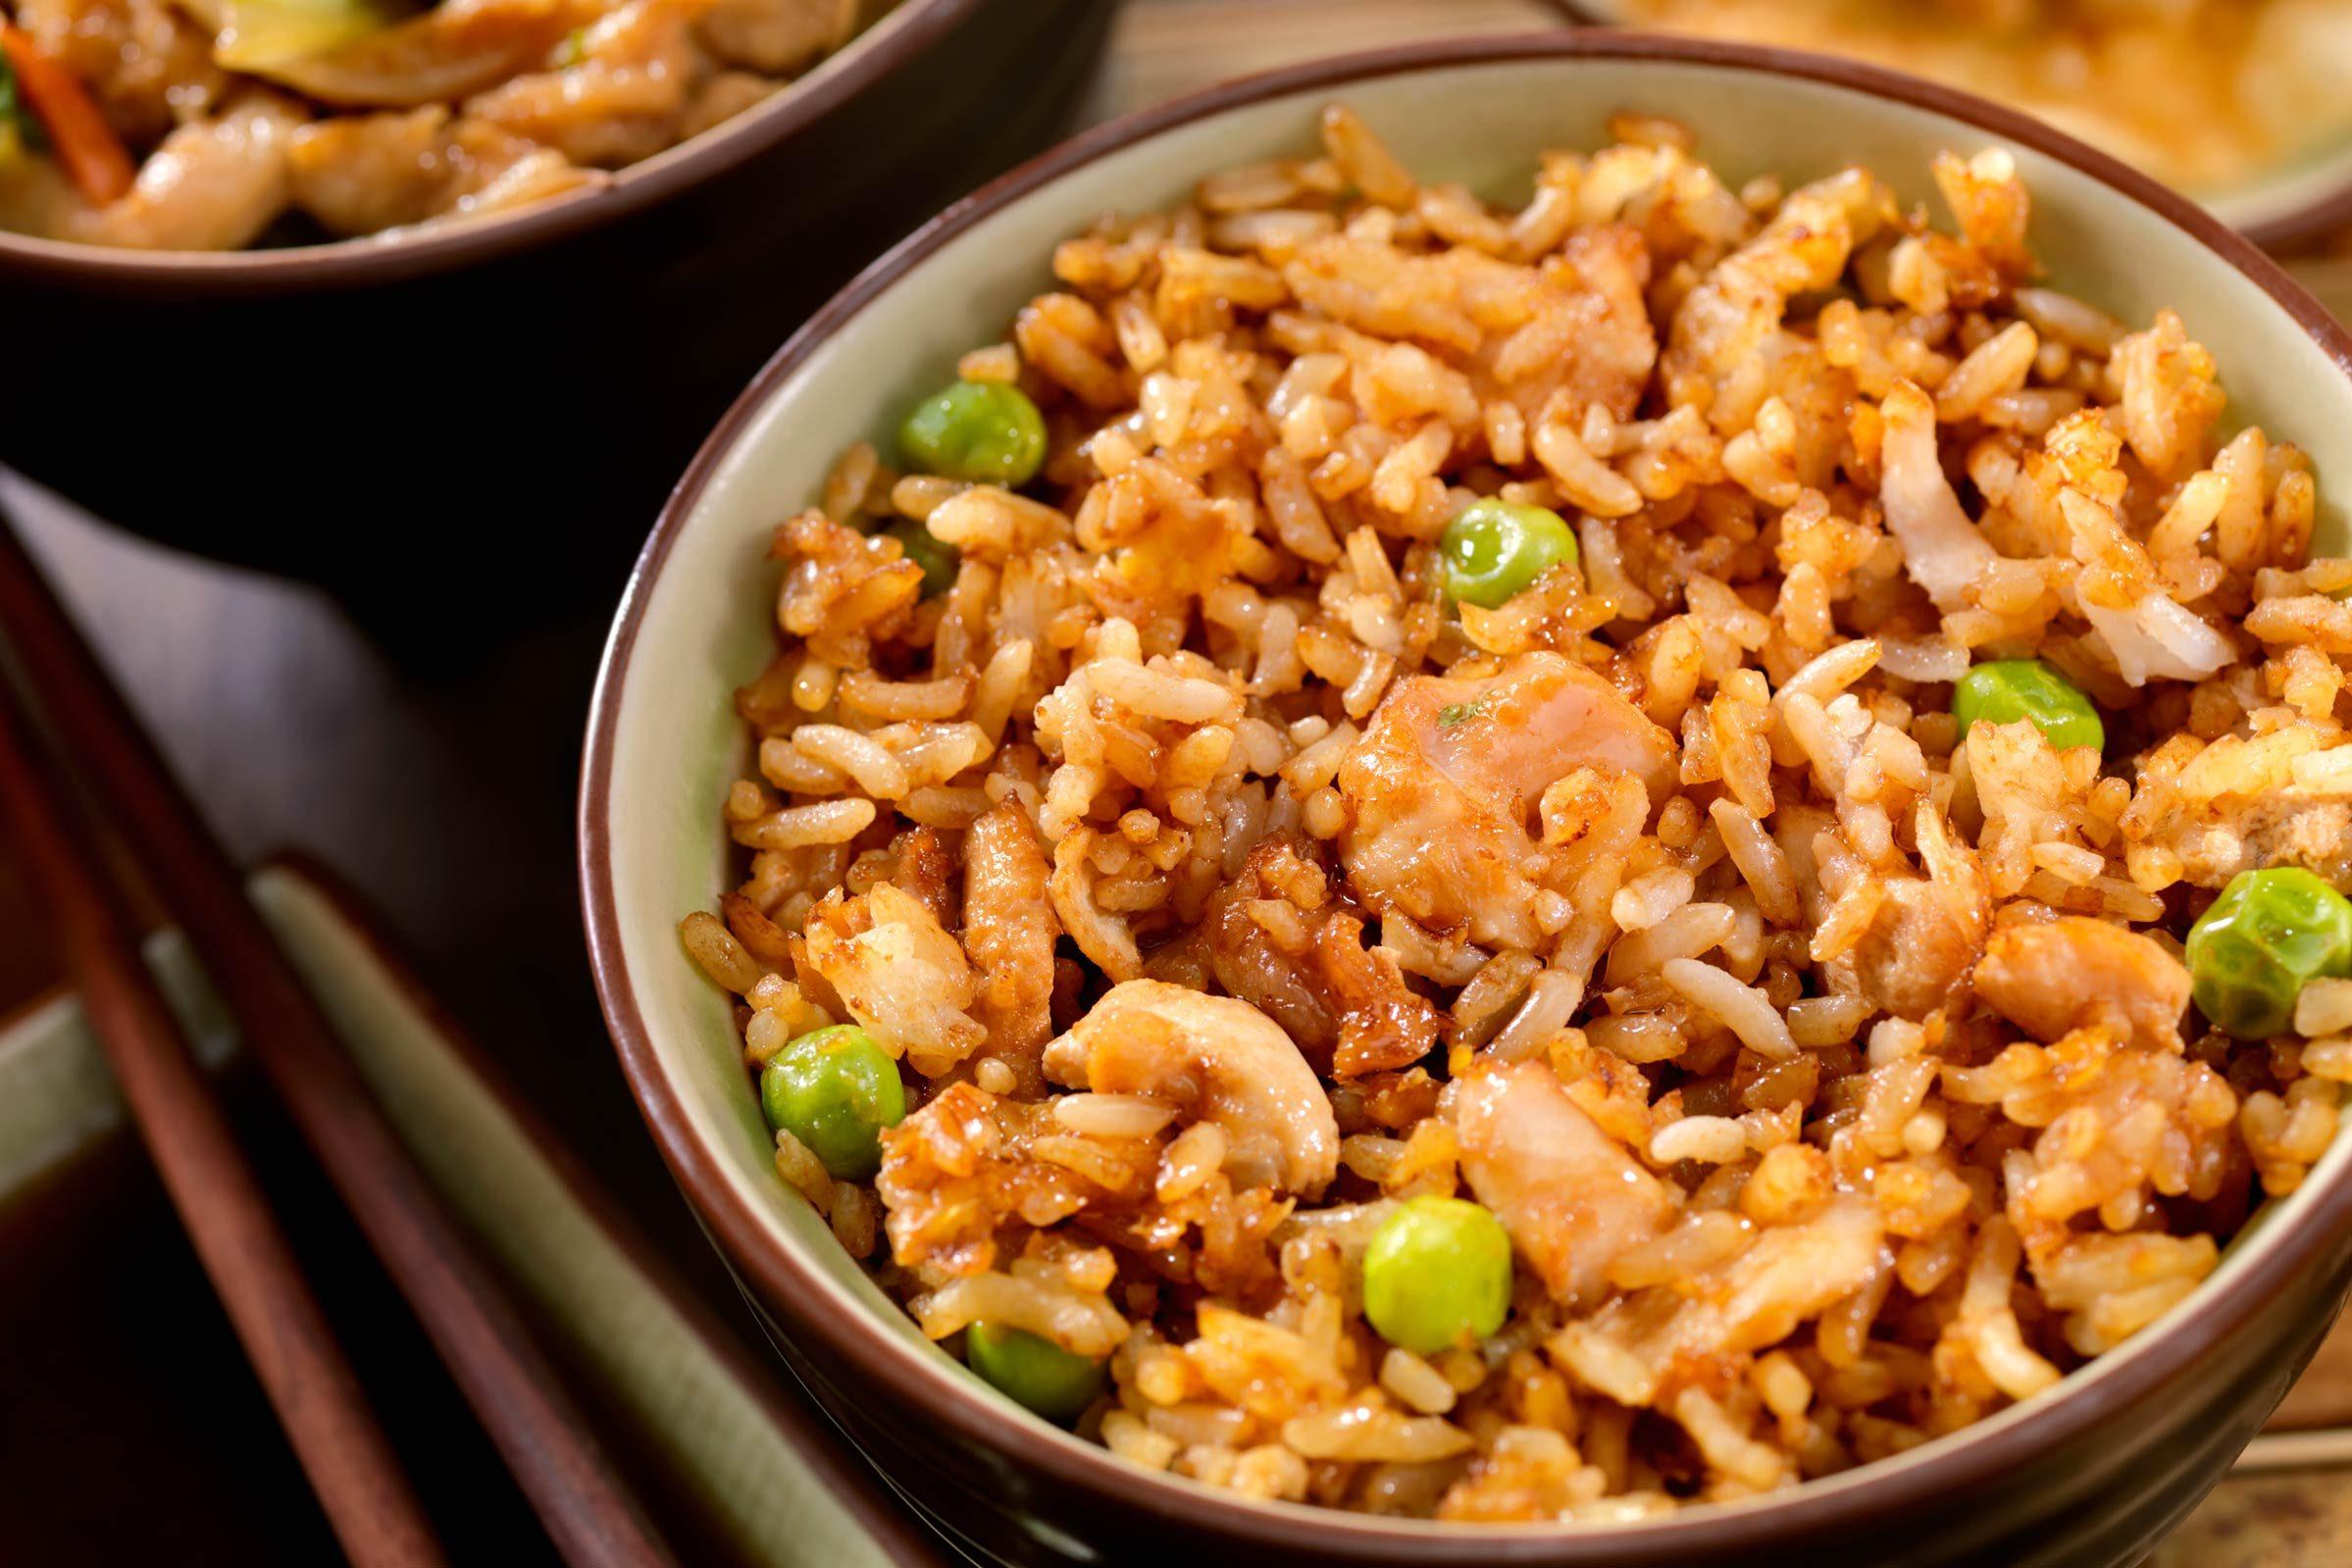 Make homemade fried rice